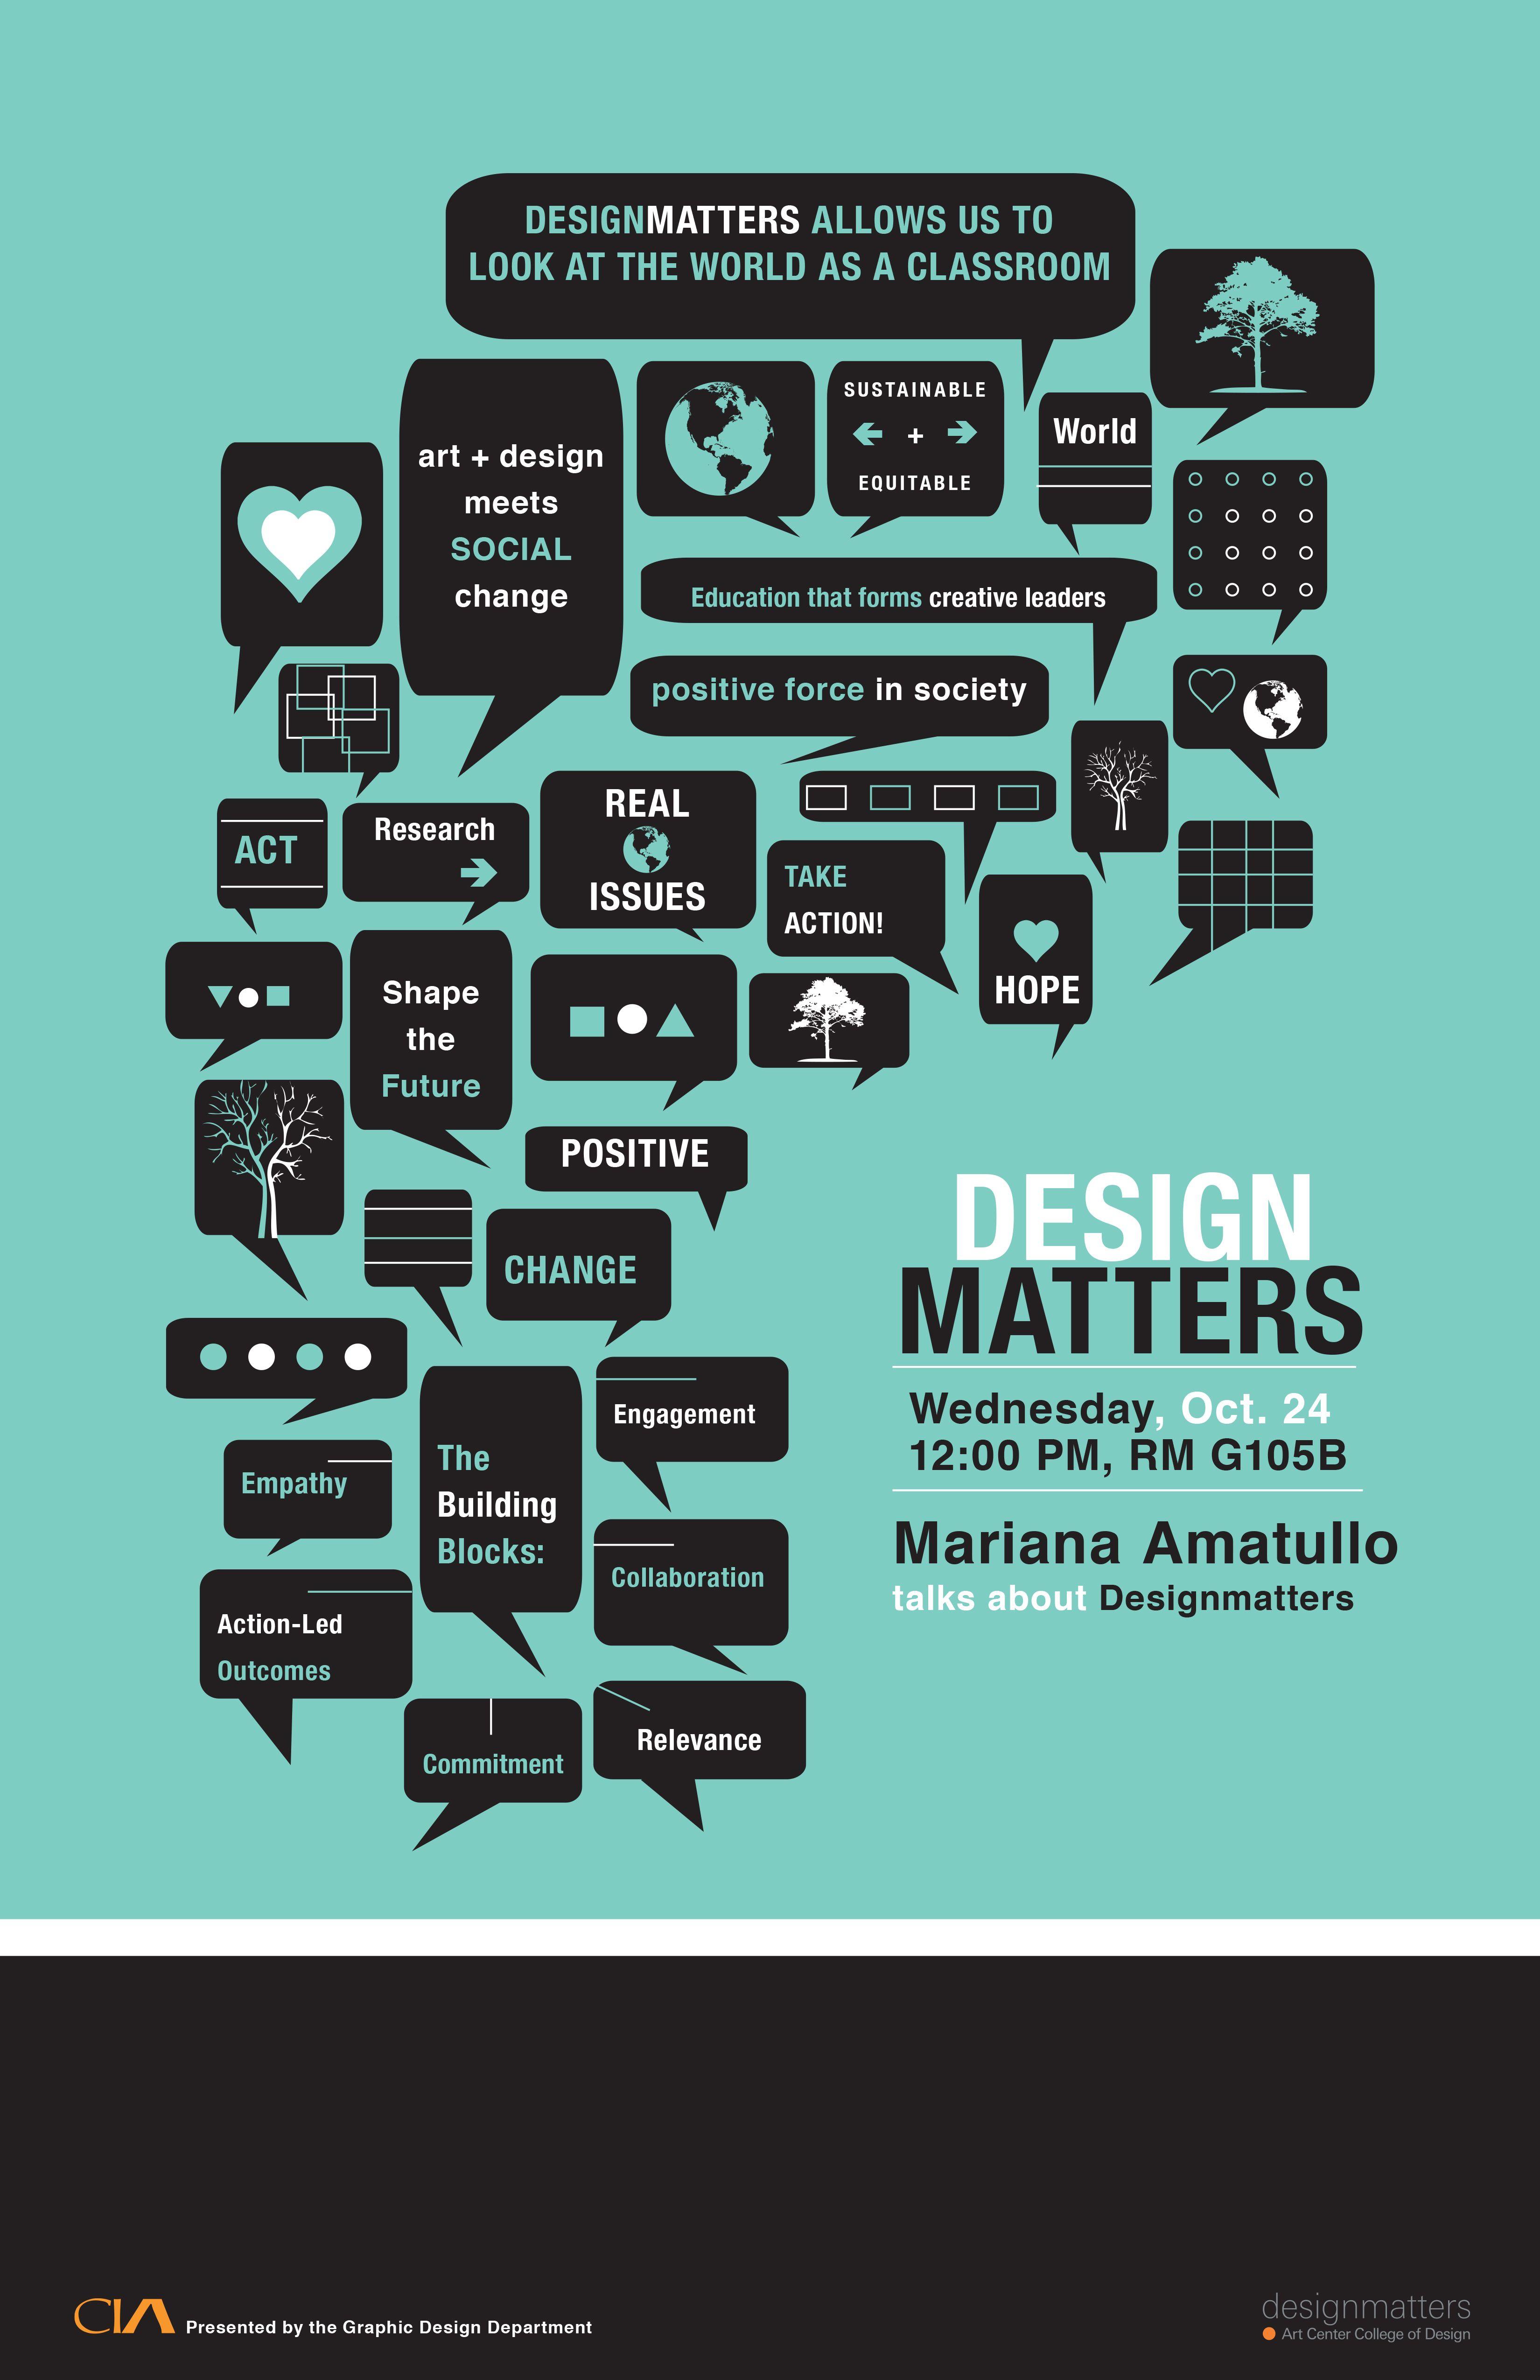 Design Matters By Danielle Hagar Graphic Design Graphic Design Course Graphic Design Student Web Design Course